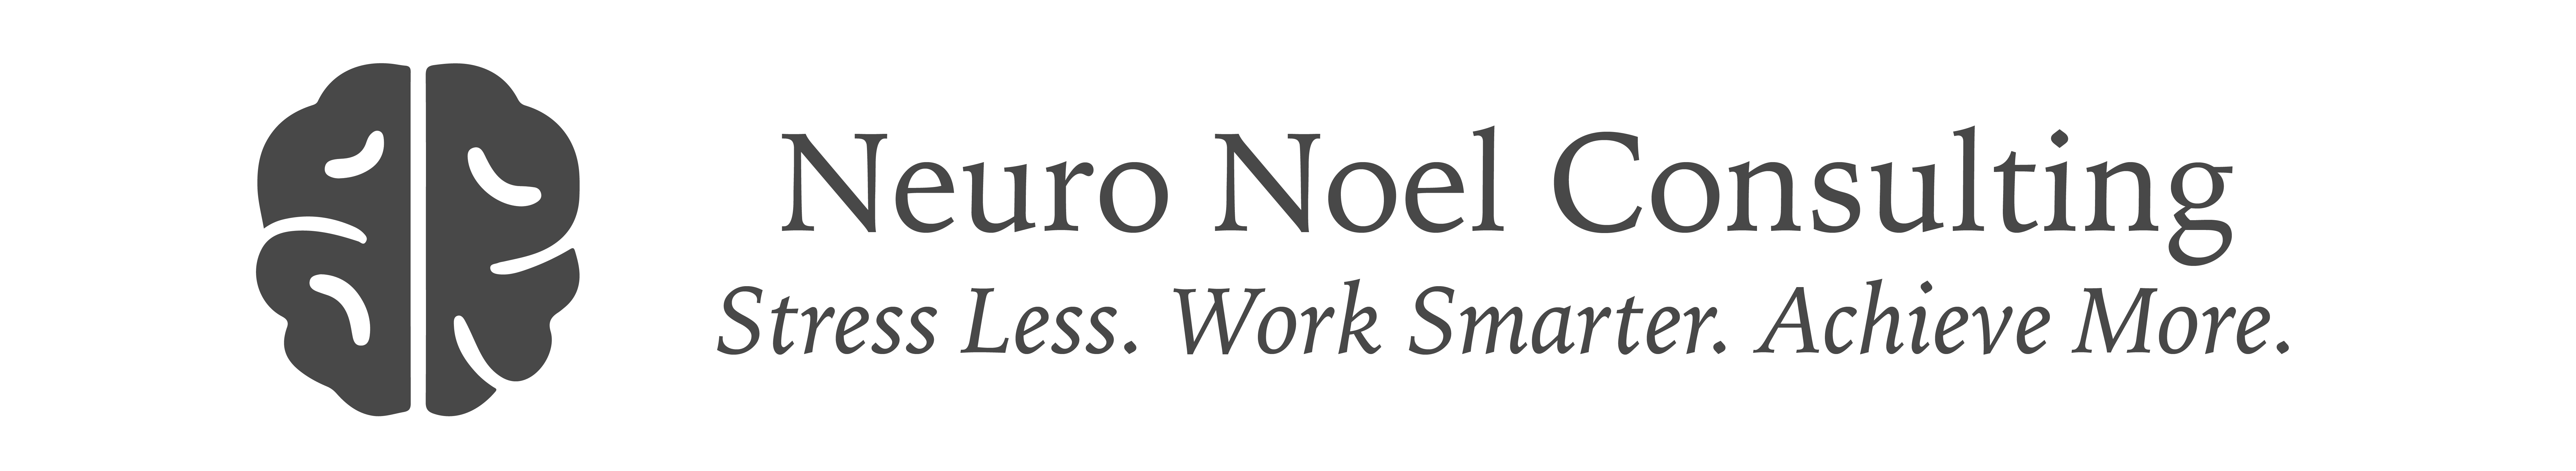 Neuro Noel Consulting